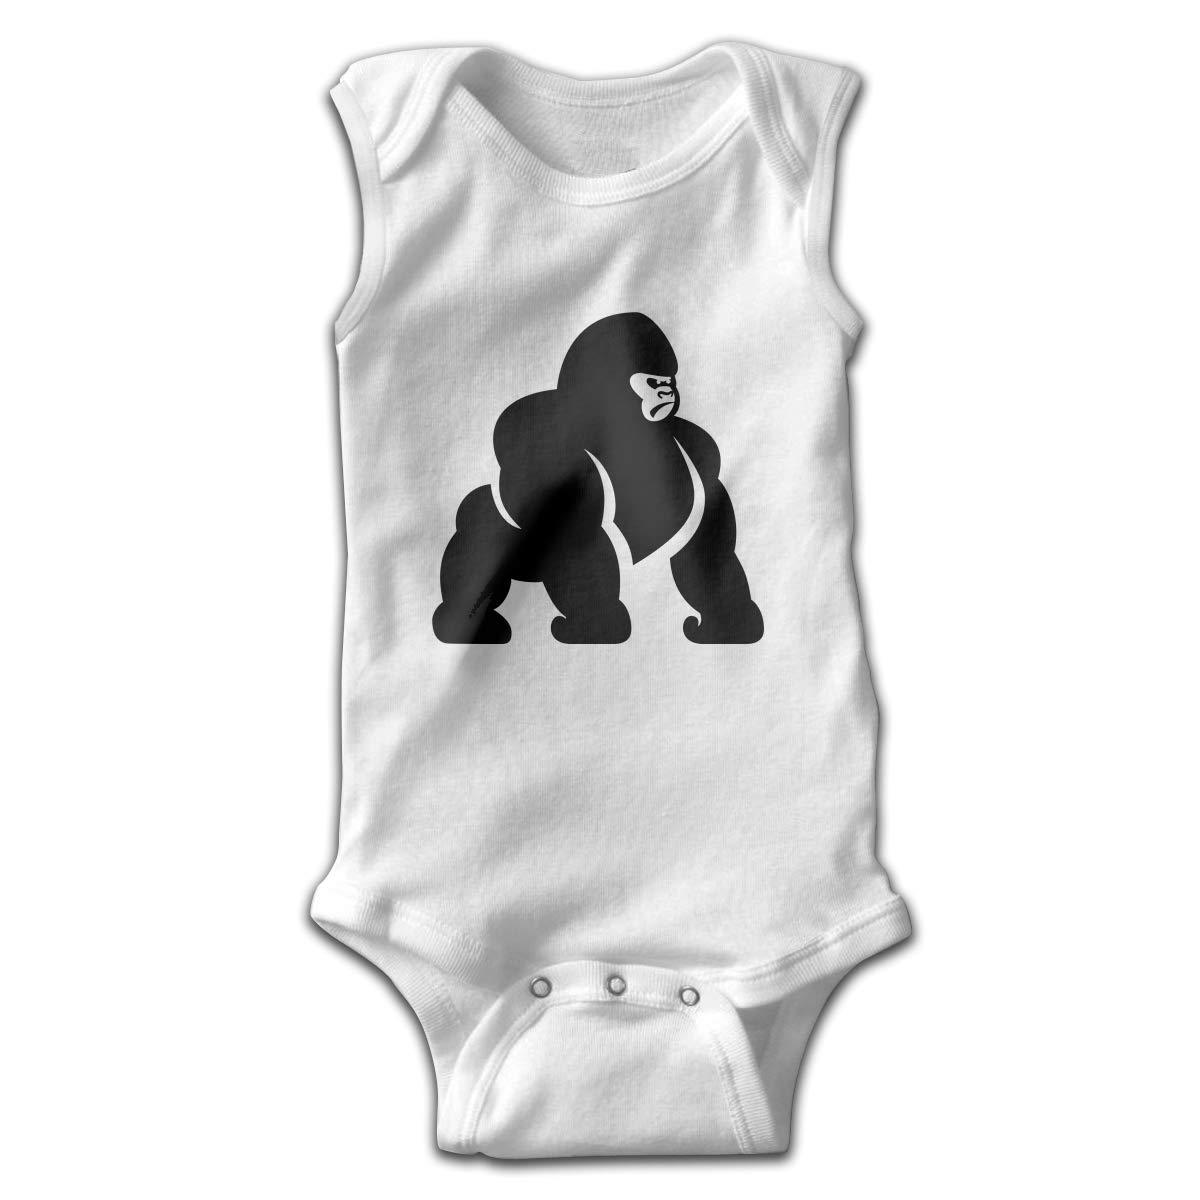 Dfenere Super Monkey Newborn Baby No Sleeve Bodysuit Romper Infant Summer Clothing White